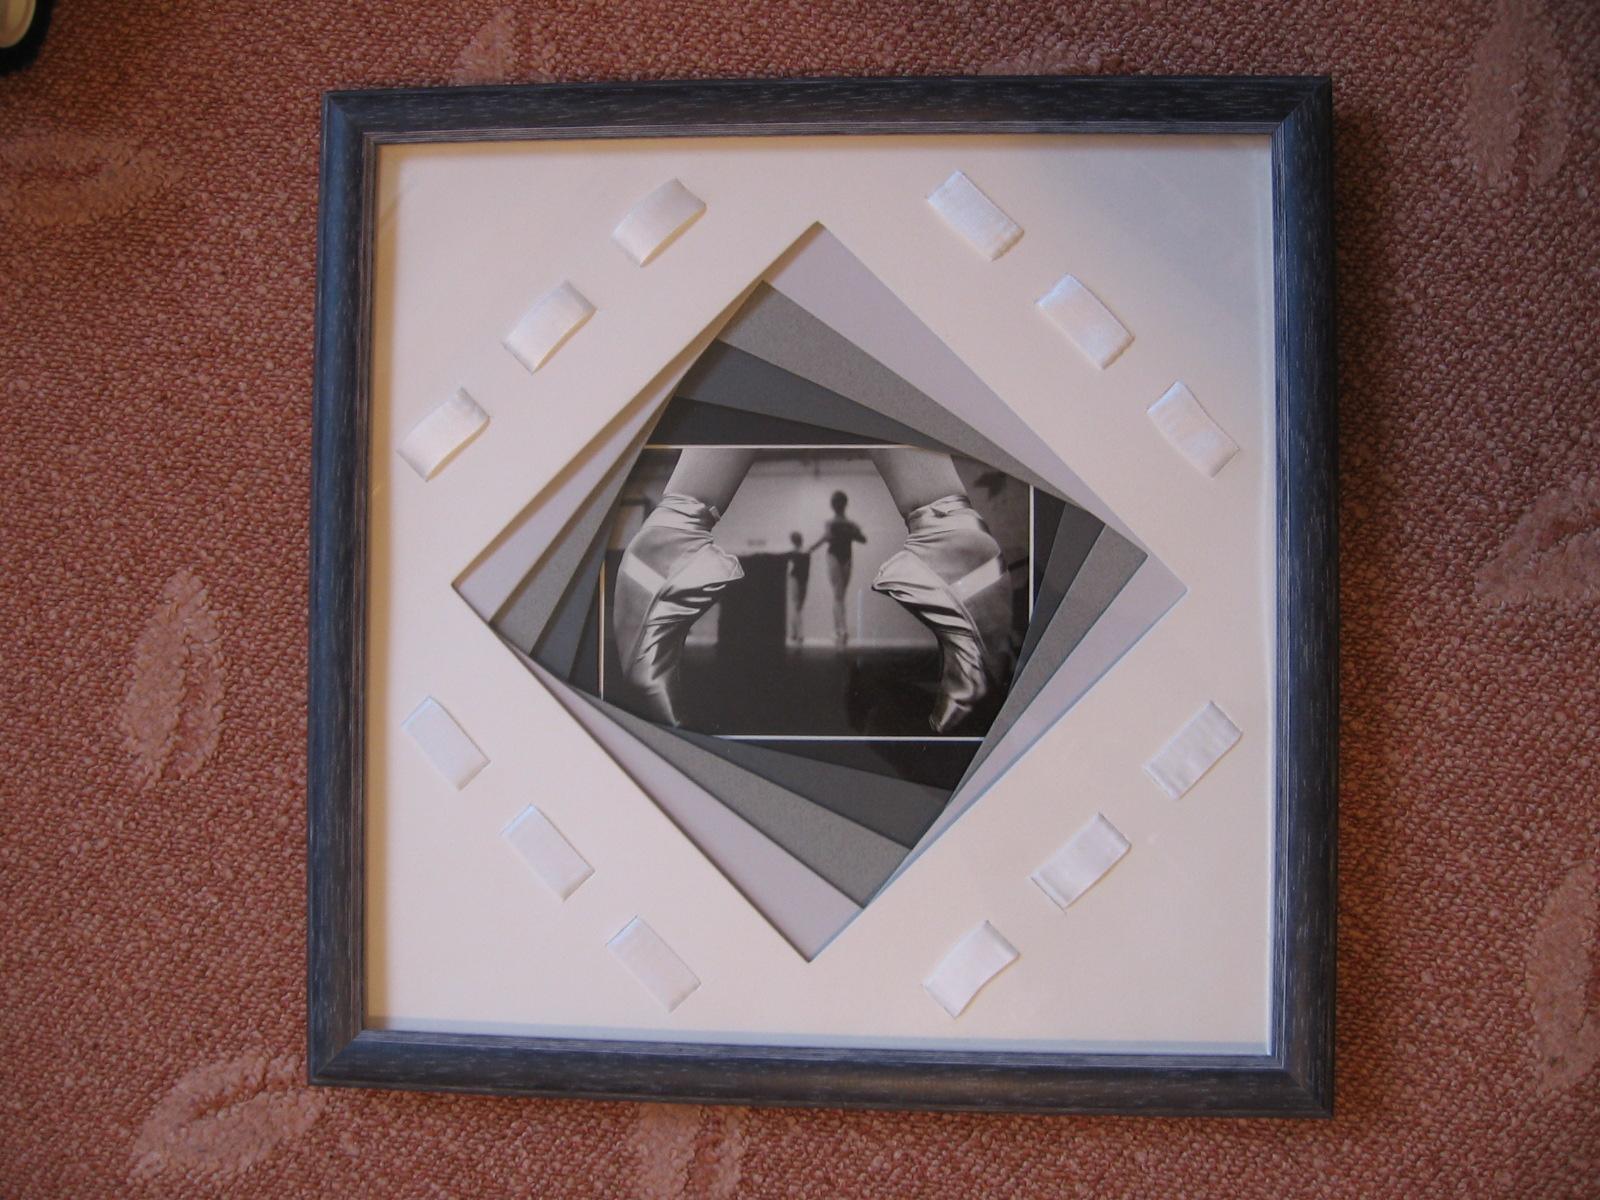 carocadres carocoud carobricole. Black Bedroom Furniture Sets. Home Design Ideas